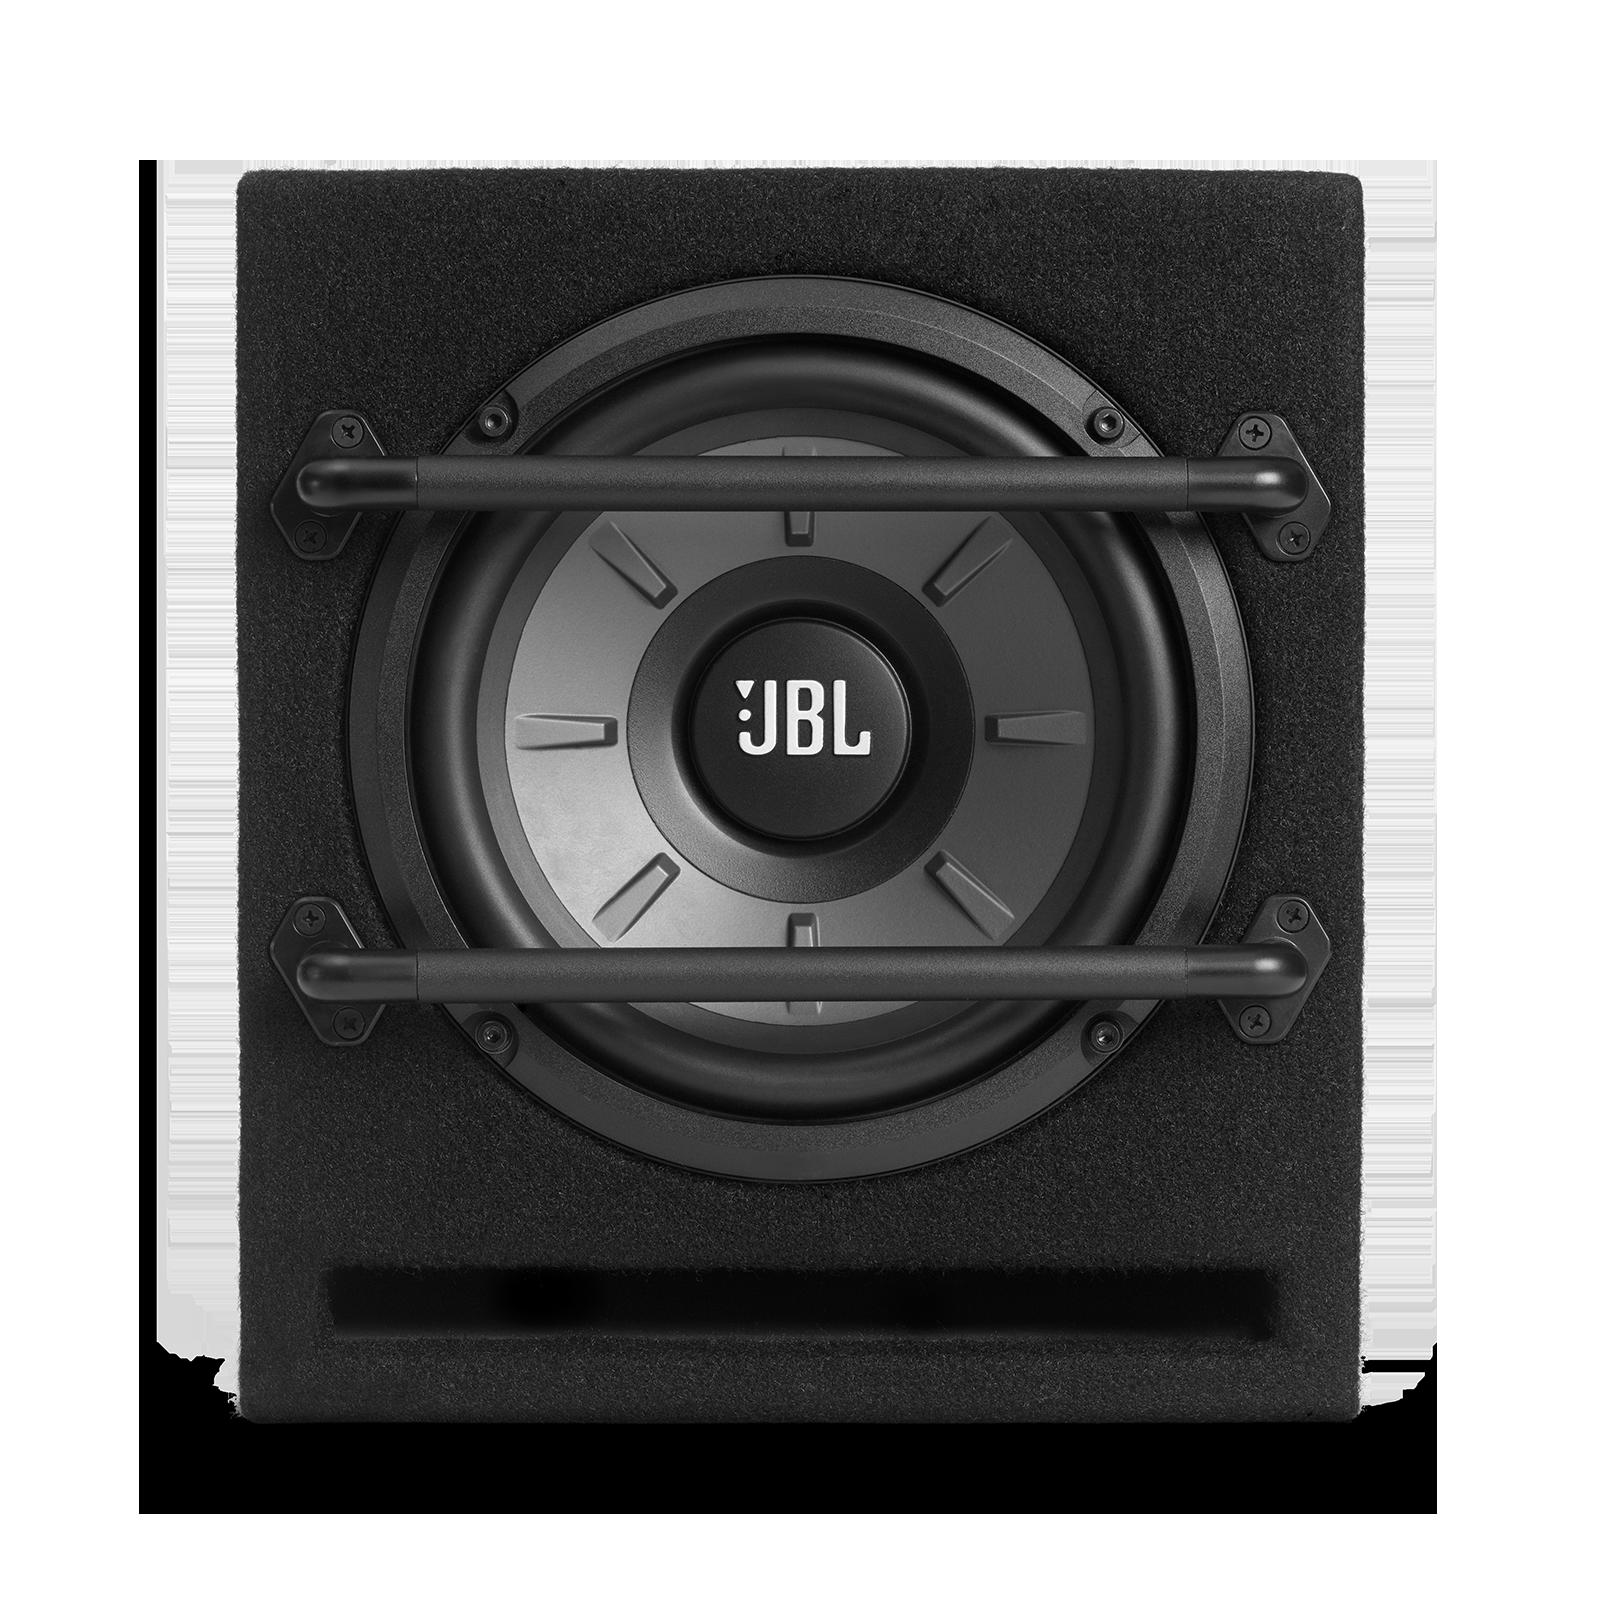 Jbl Stage 800ba Enclosure Series Powered 8 200mm Subwoofer Dual Wiring Kit With 14 Gauge Speaker